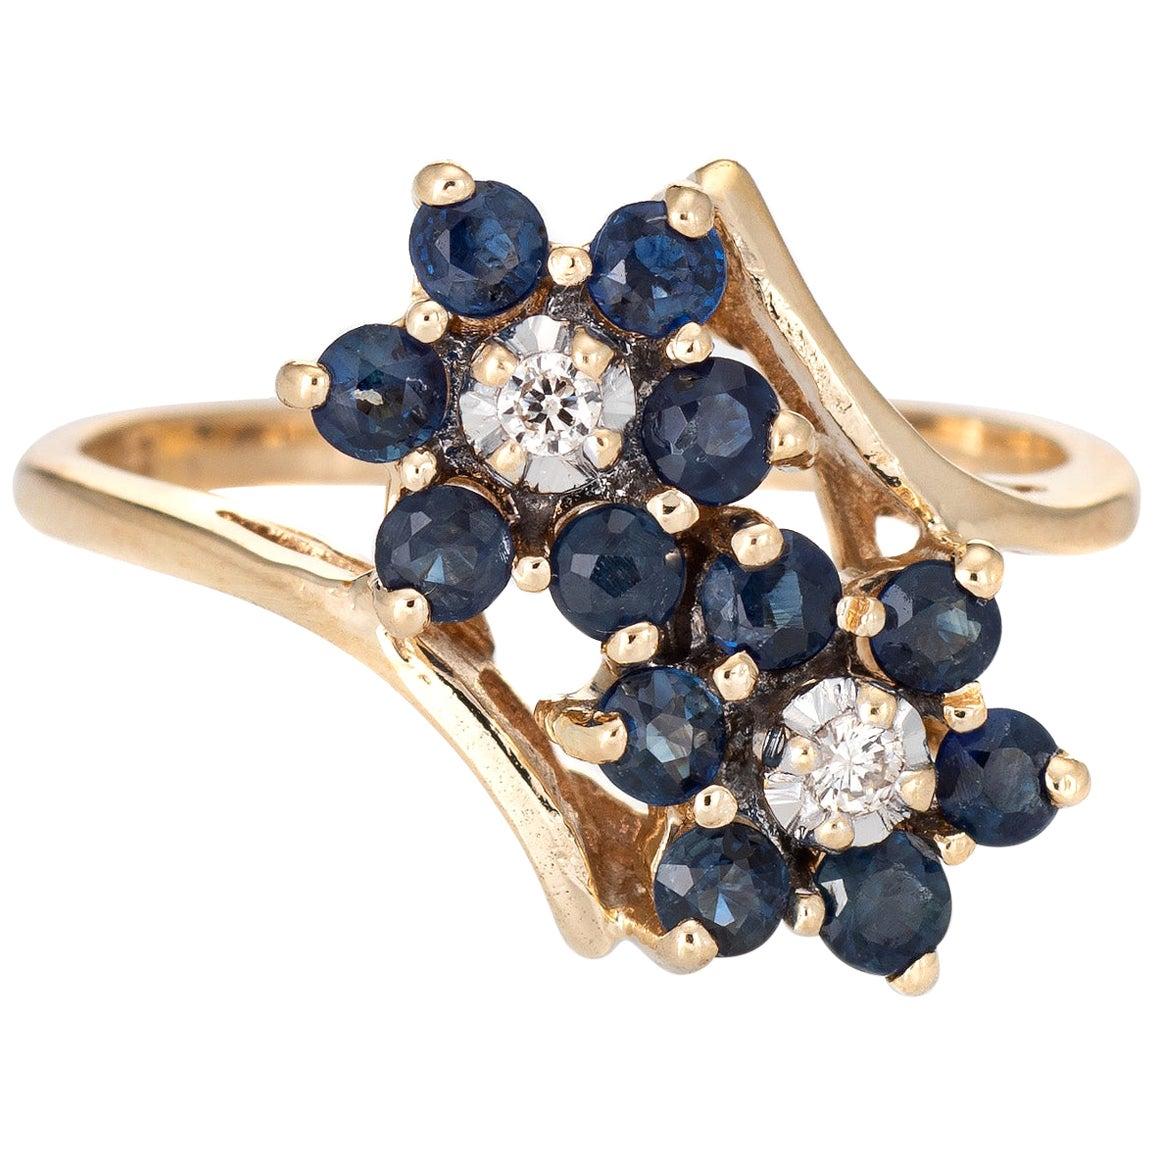 Sapphire Diamond Double Flower Ring Toi Et Moi 10 Karat Gold Vintage Jewelry